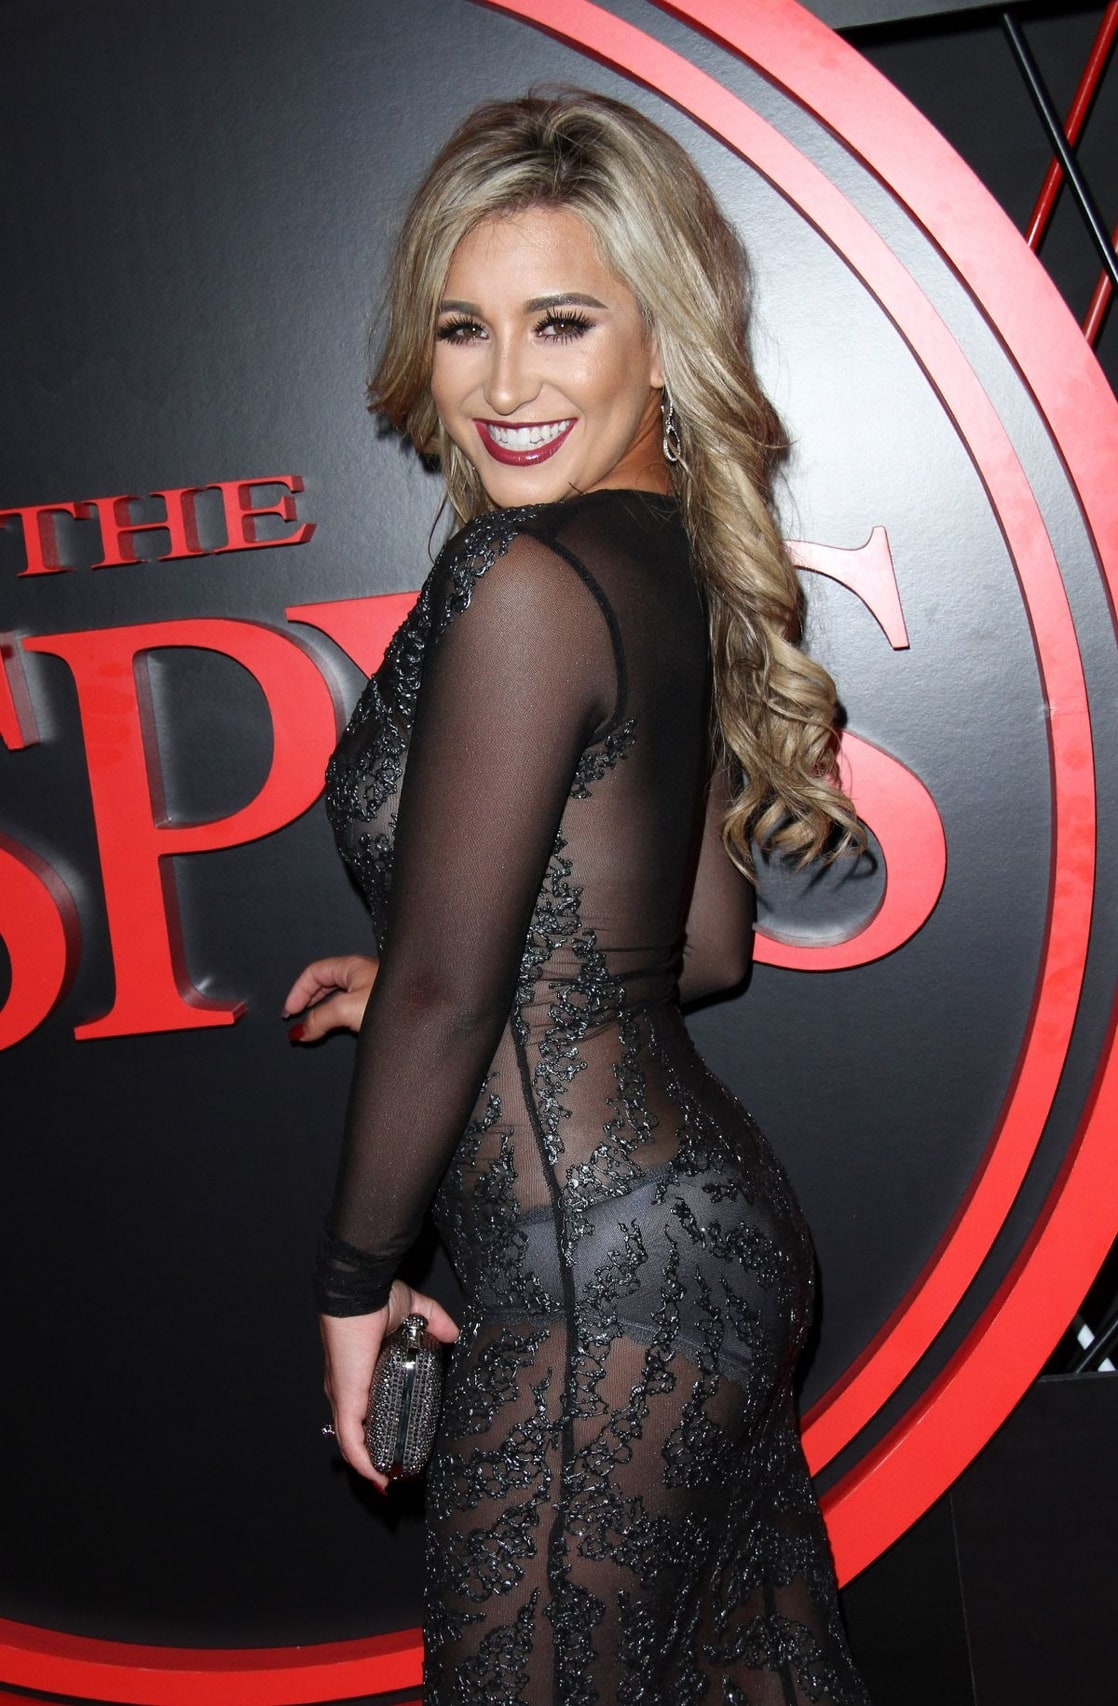 Young Chelsea Lynn Pezzola nude (18 photos), Topless, Bikini, Boobs, see through 2018